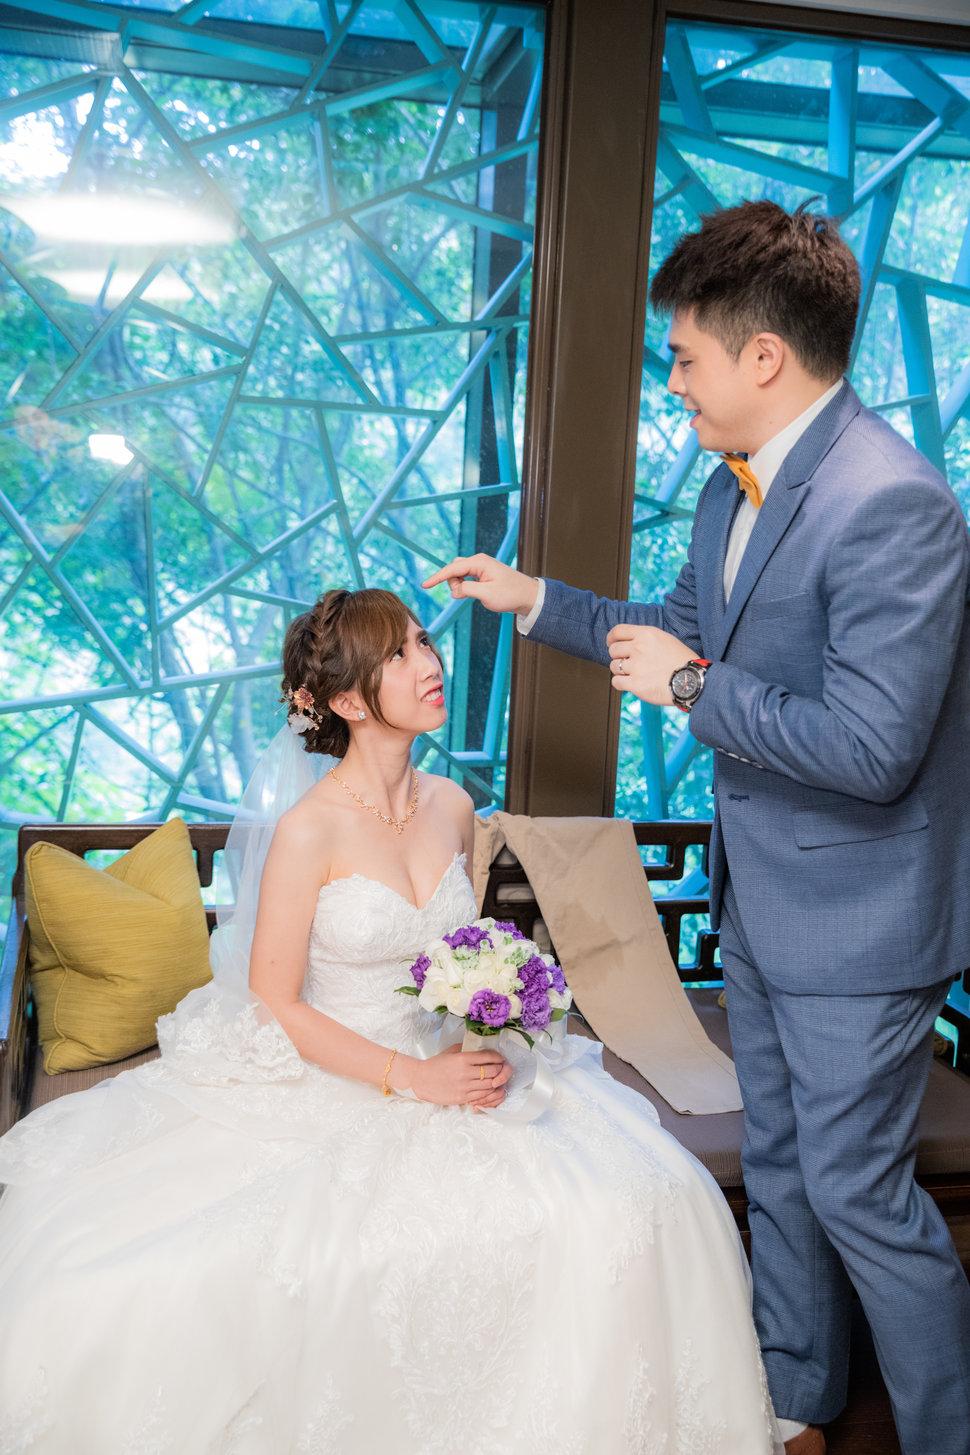 0923-31 - 達特瑋攝影Wei Photography《結婚吧》